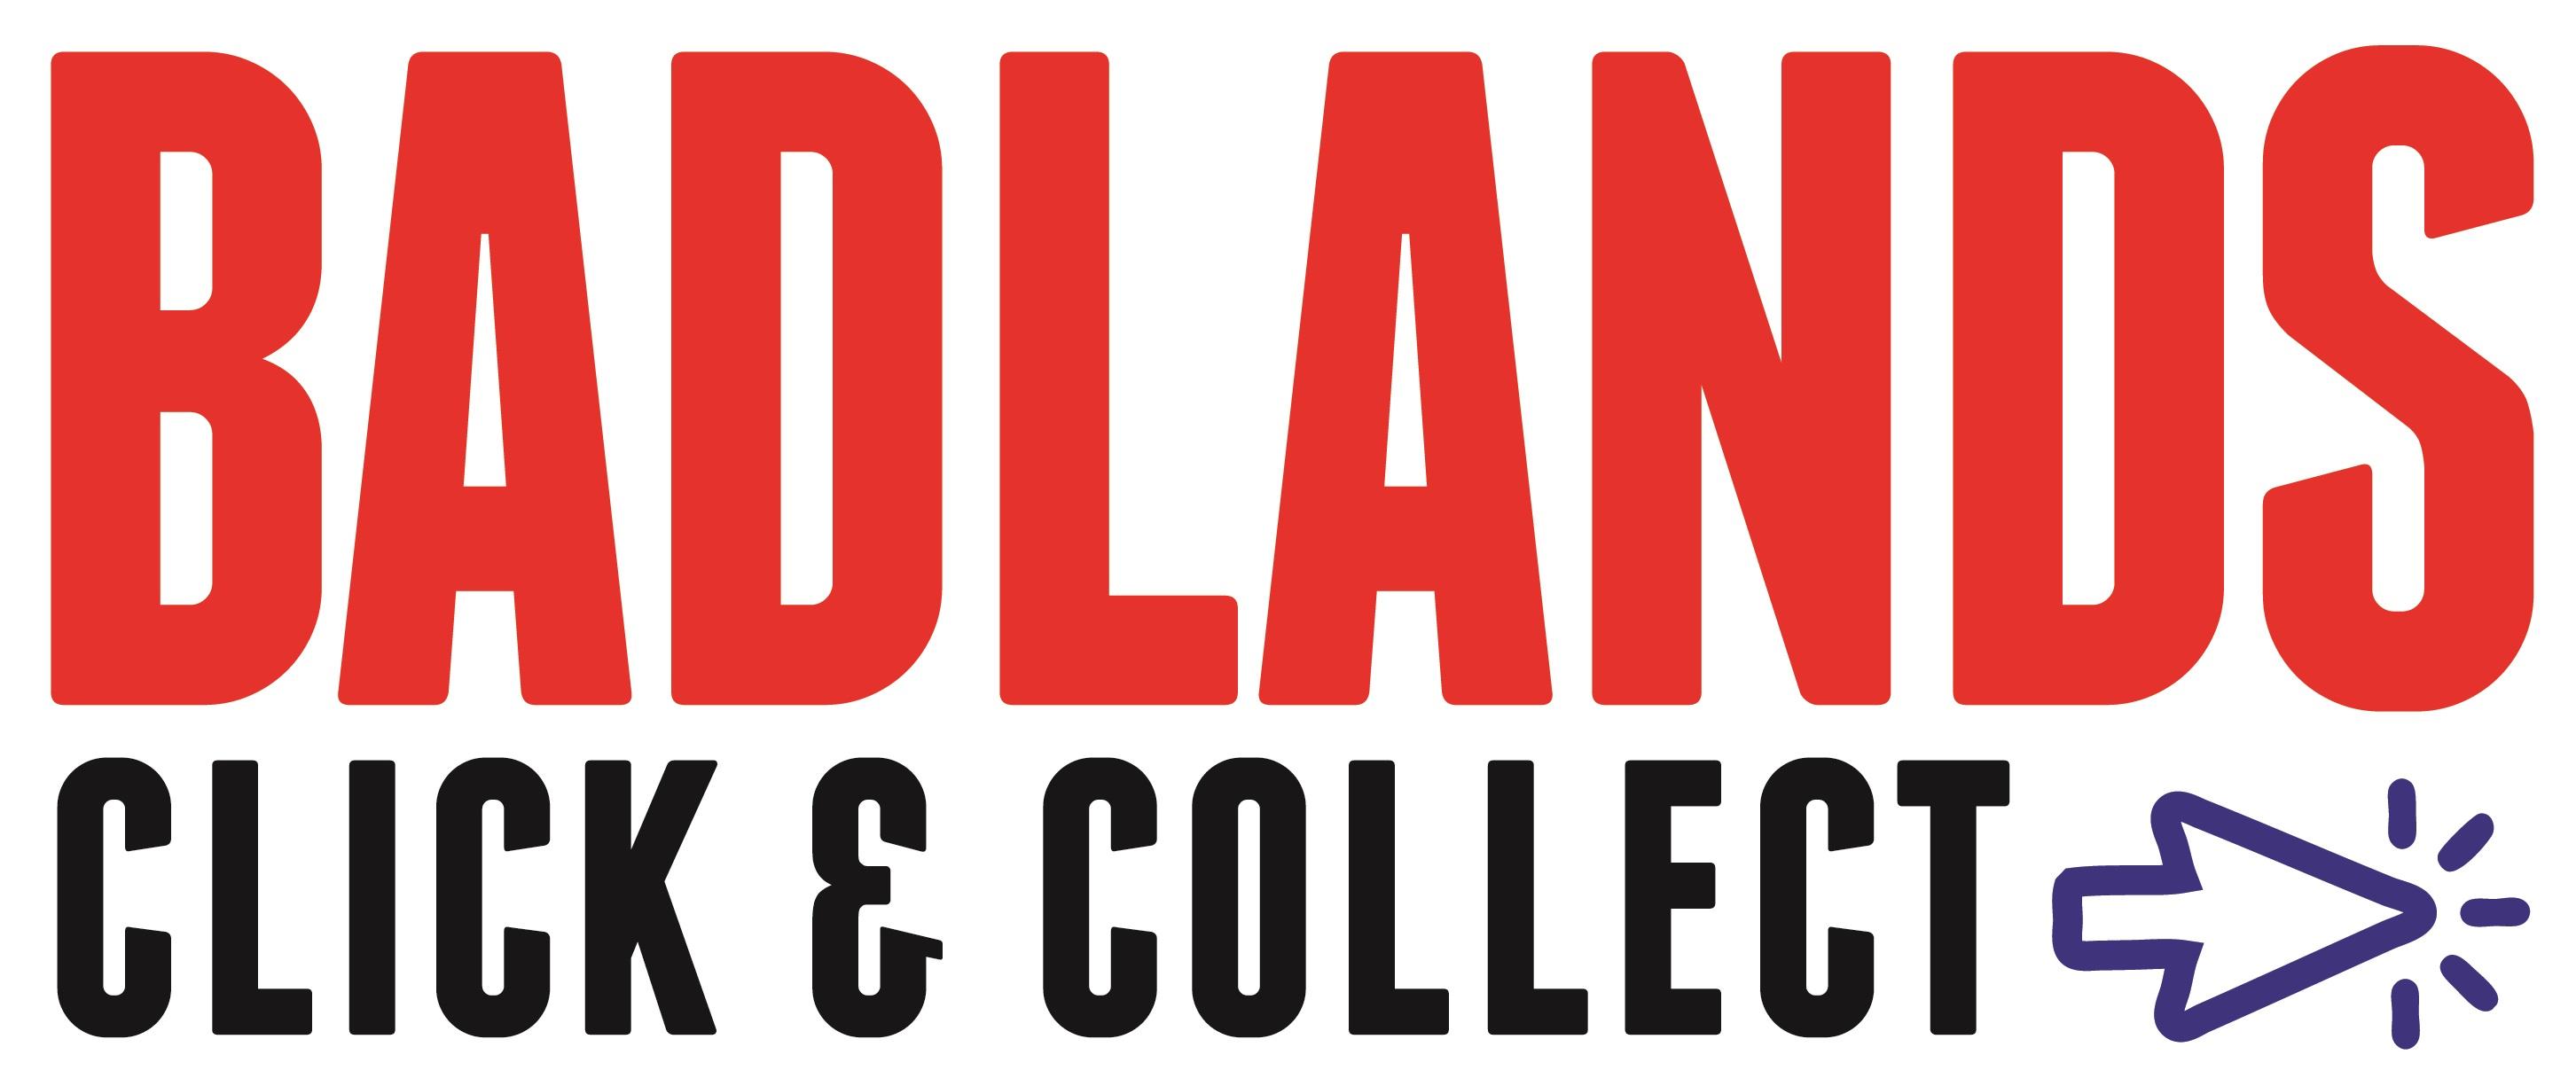 badlands-click-collect